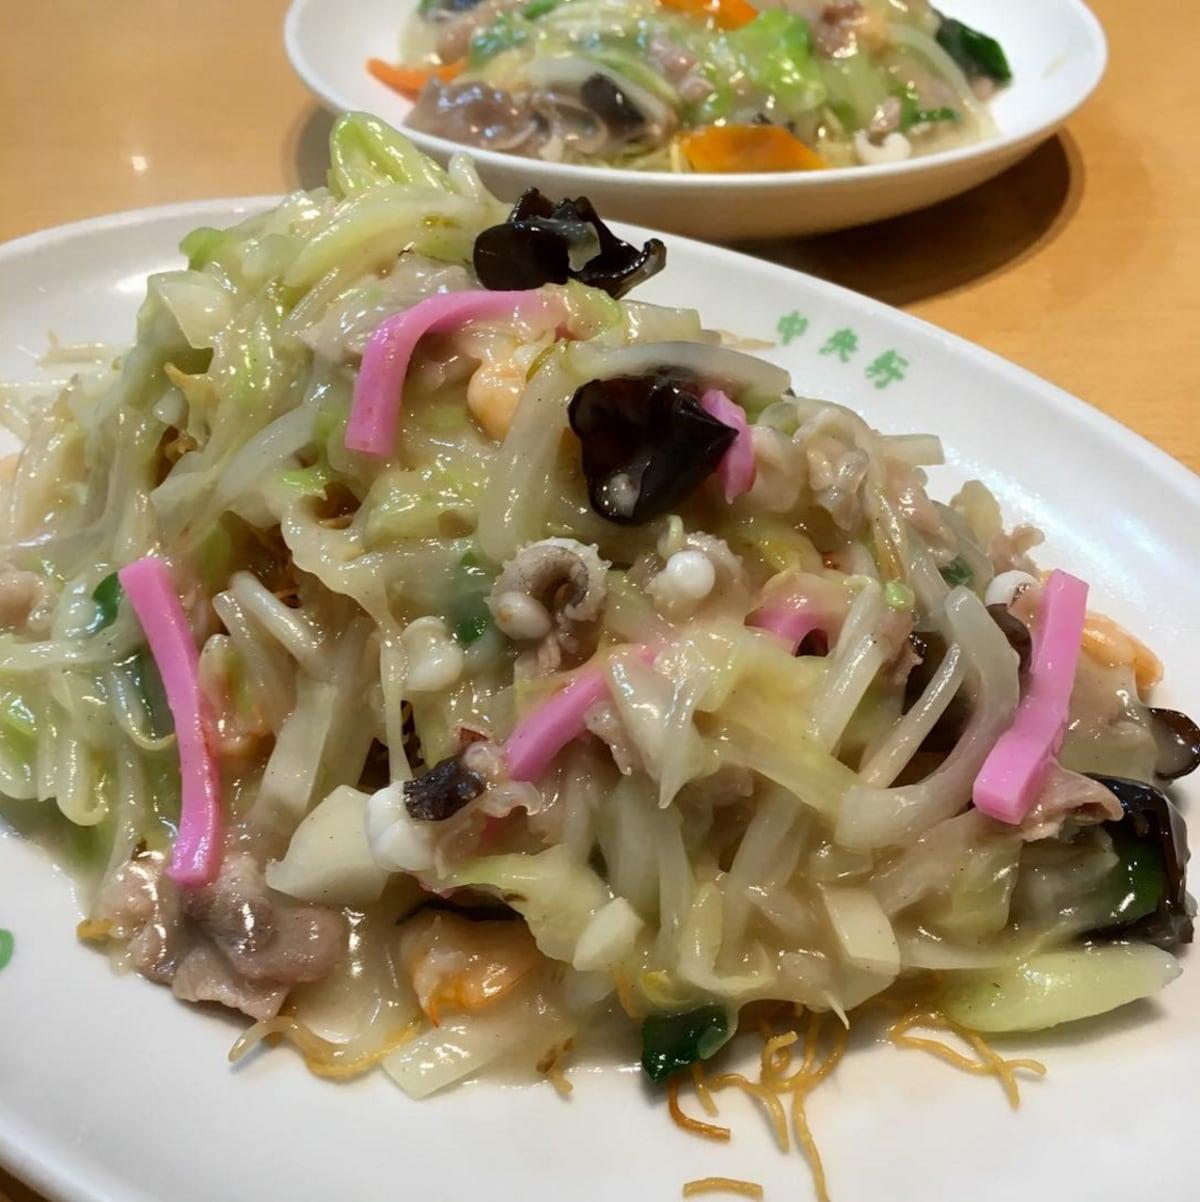 8. Sara Udon: A crispy udon